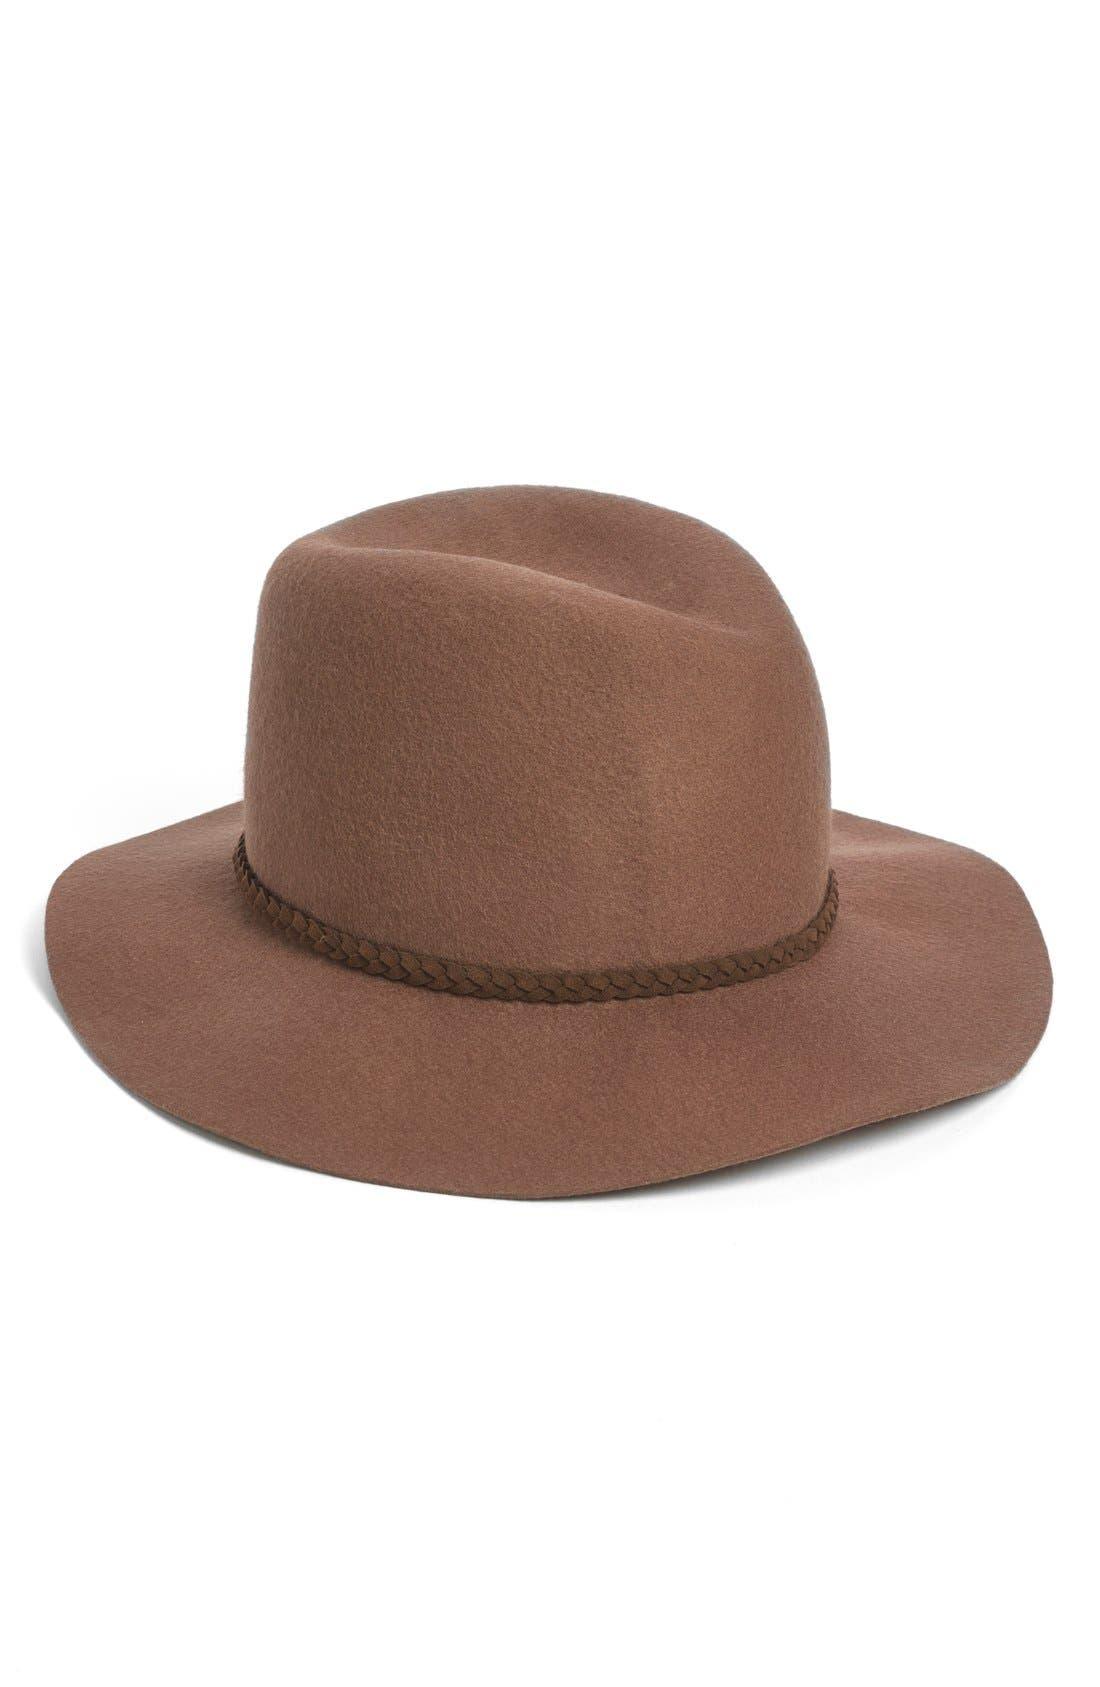 Main Image - Hinge Felt Panama Hat